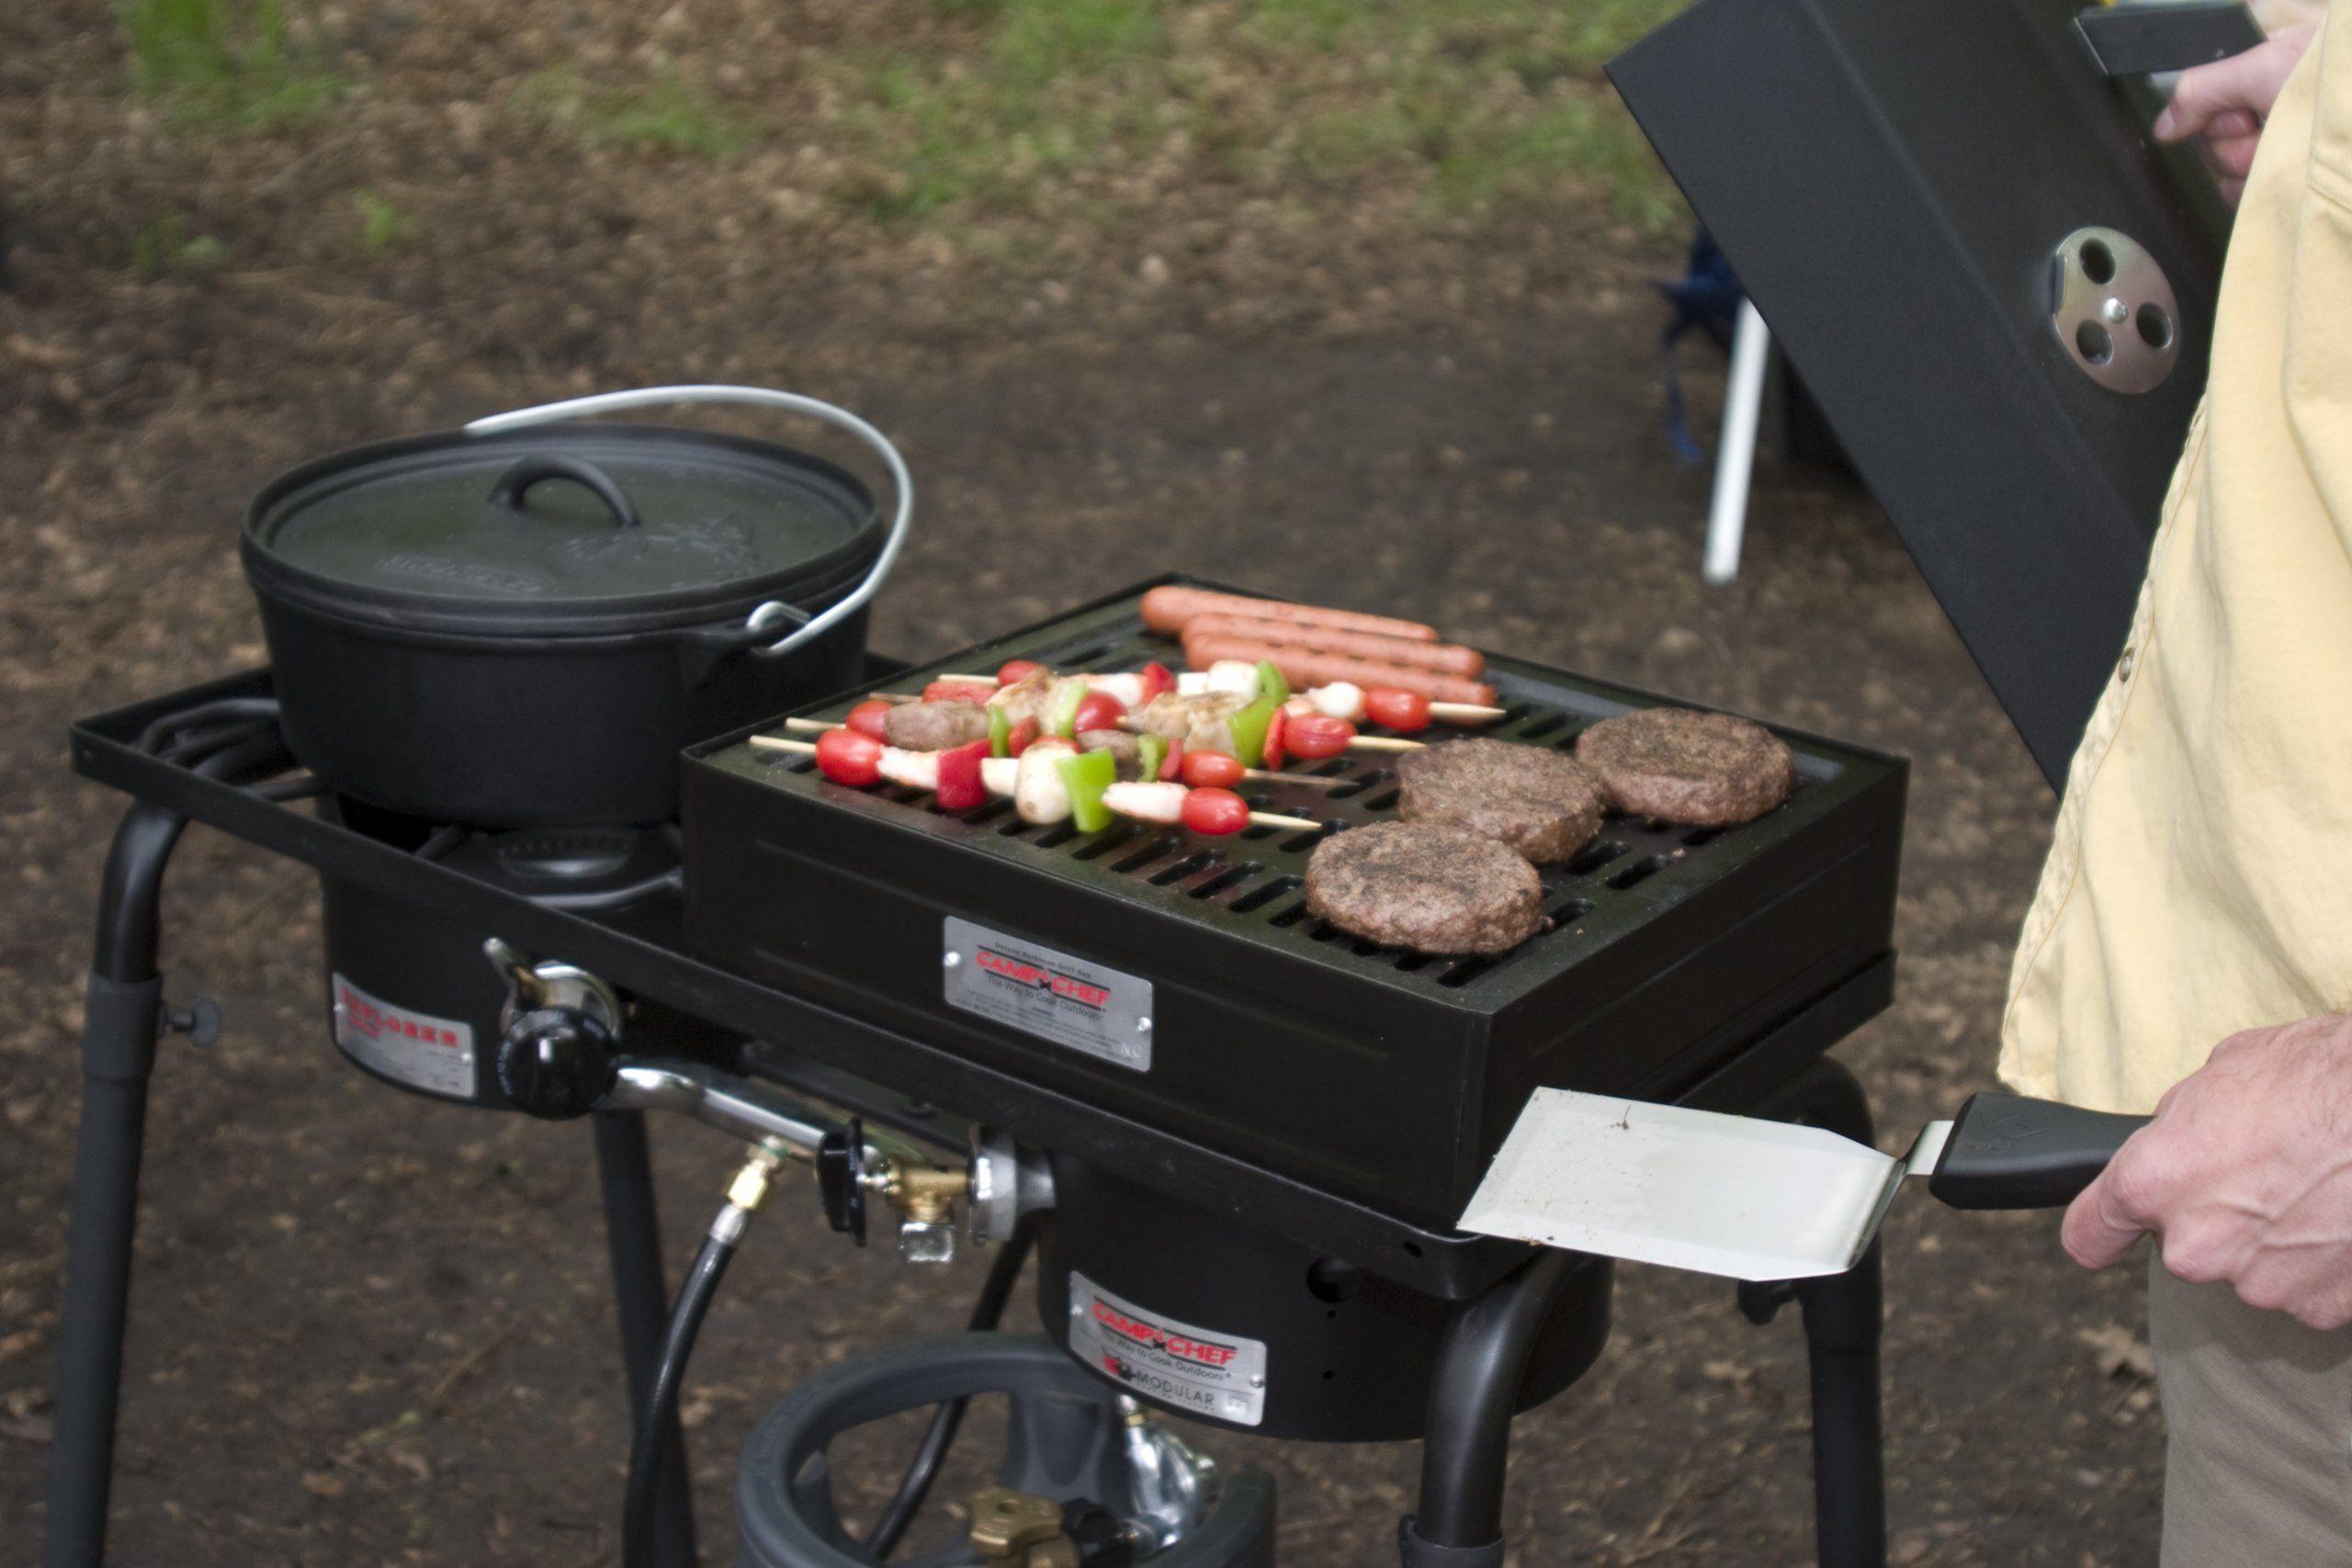 Camp Chef Barbecue Grill Box for Single Burner